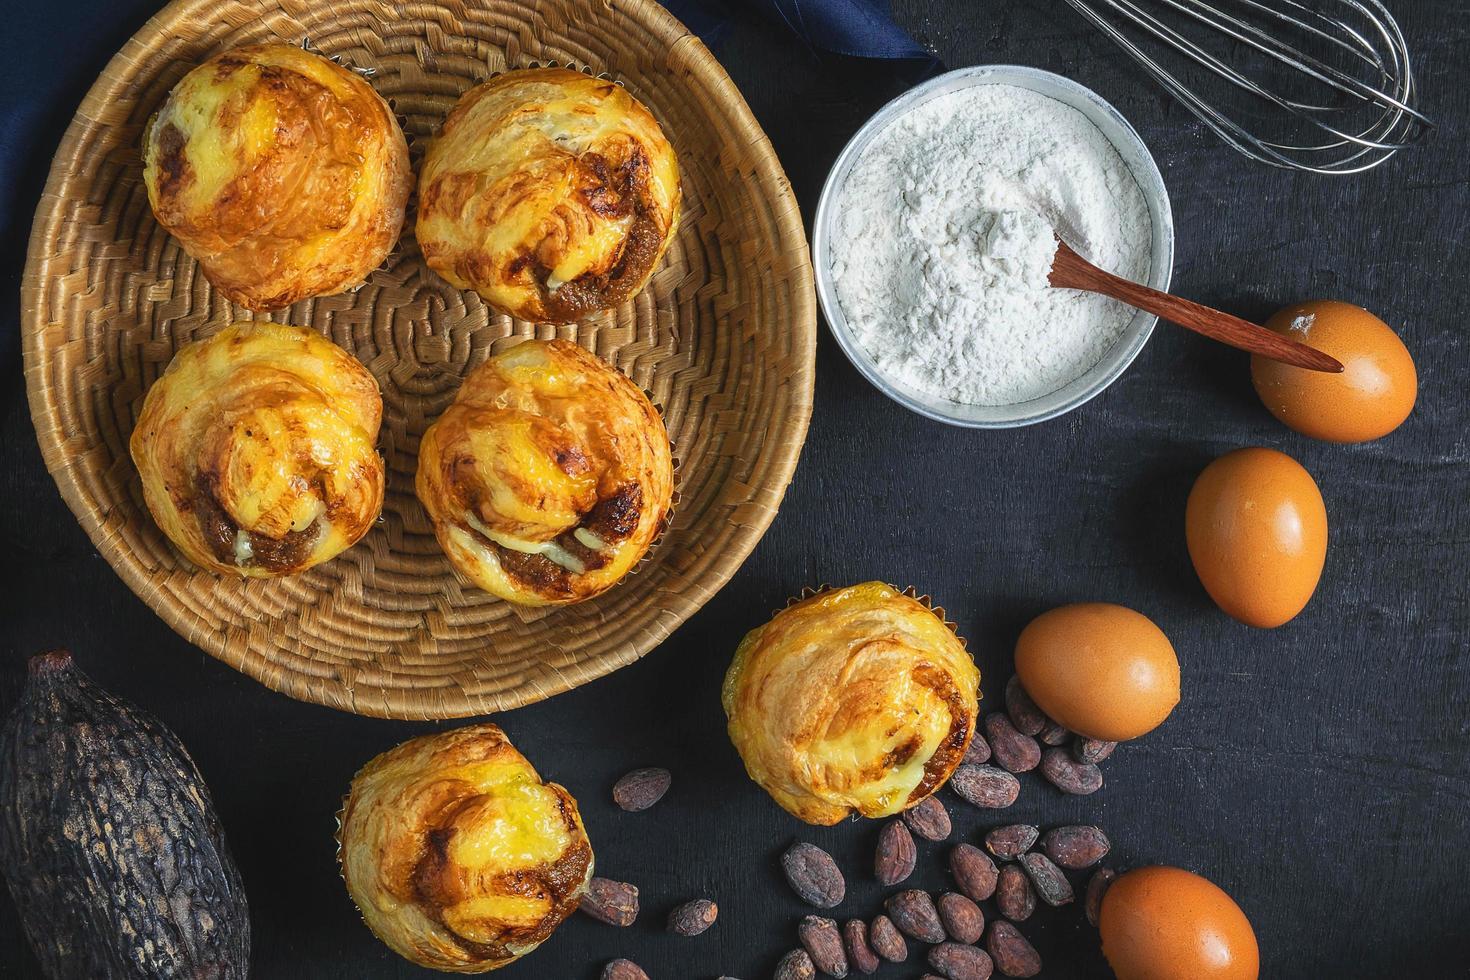 Frühstücksgebäck mit Zutaten foto